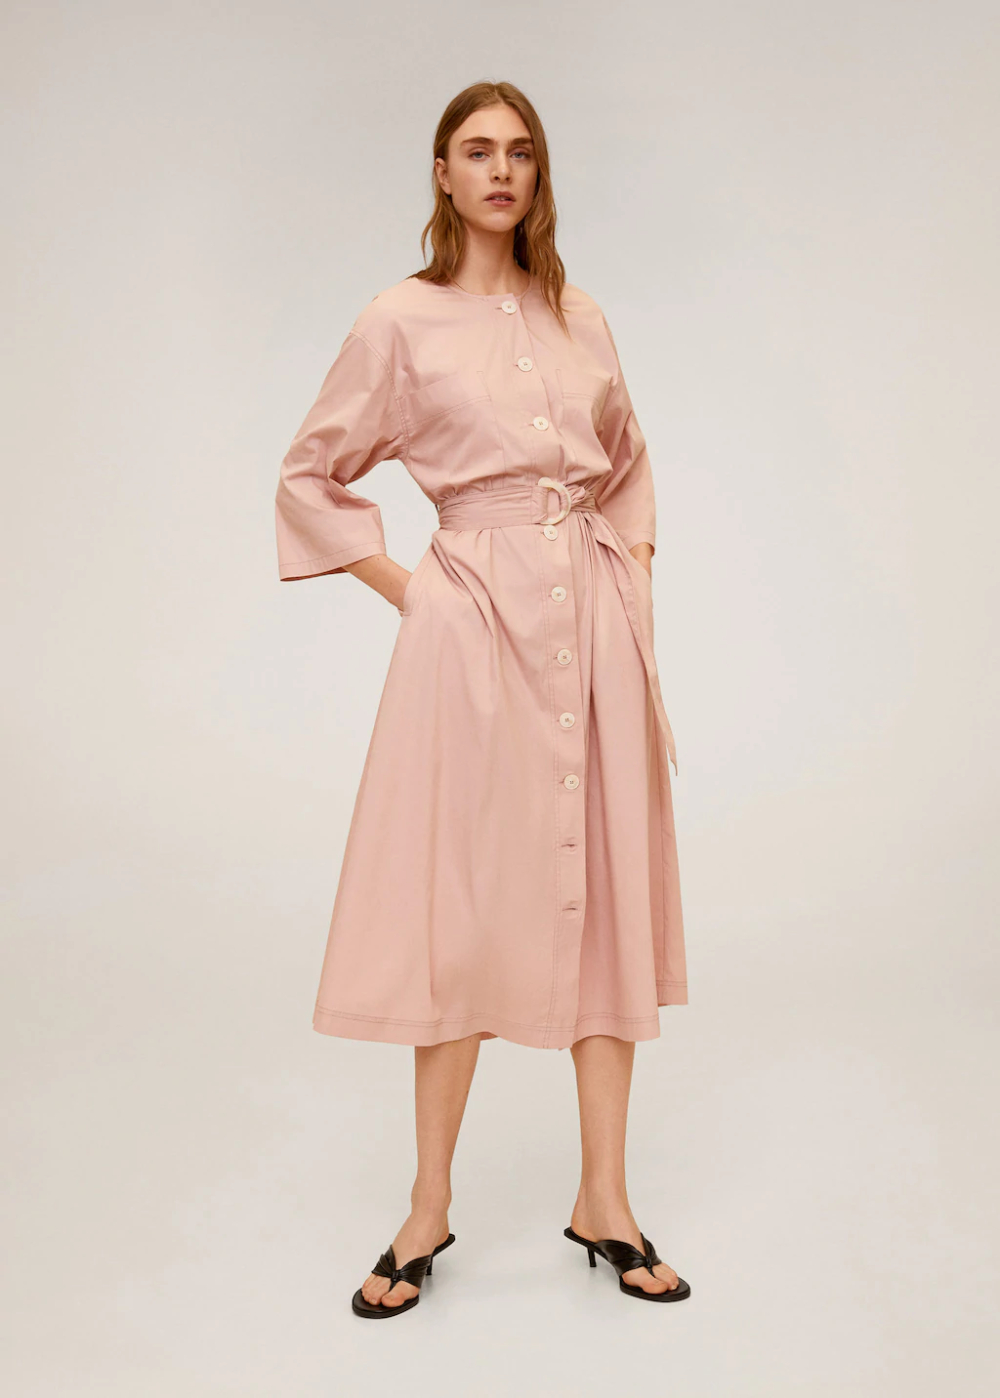 Buttons Cotton Dress  Woman  Mango Singapore In 2020